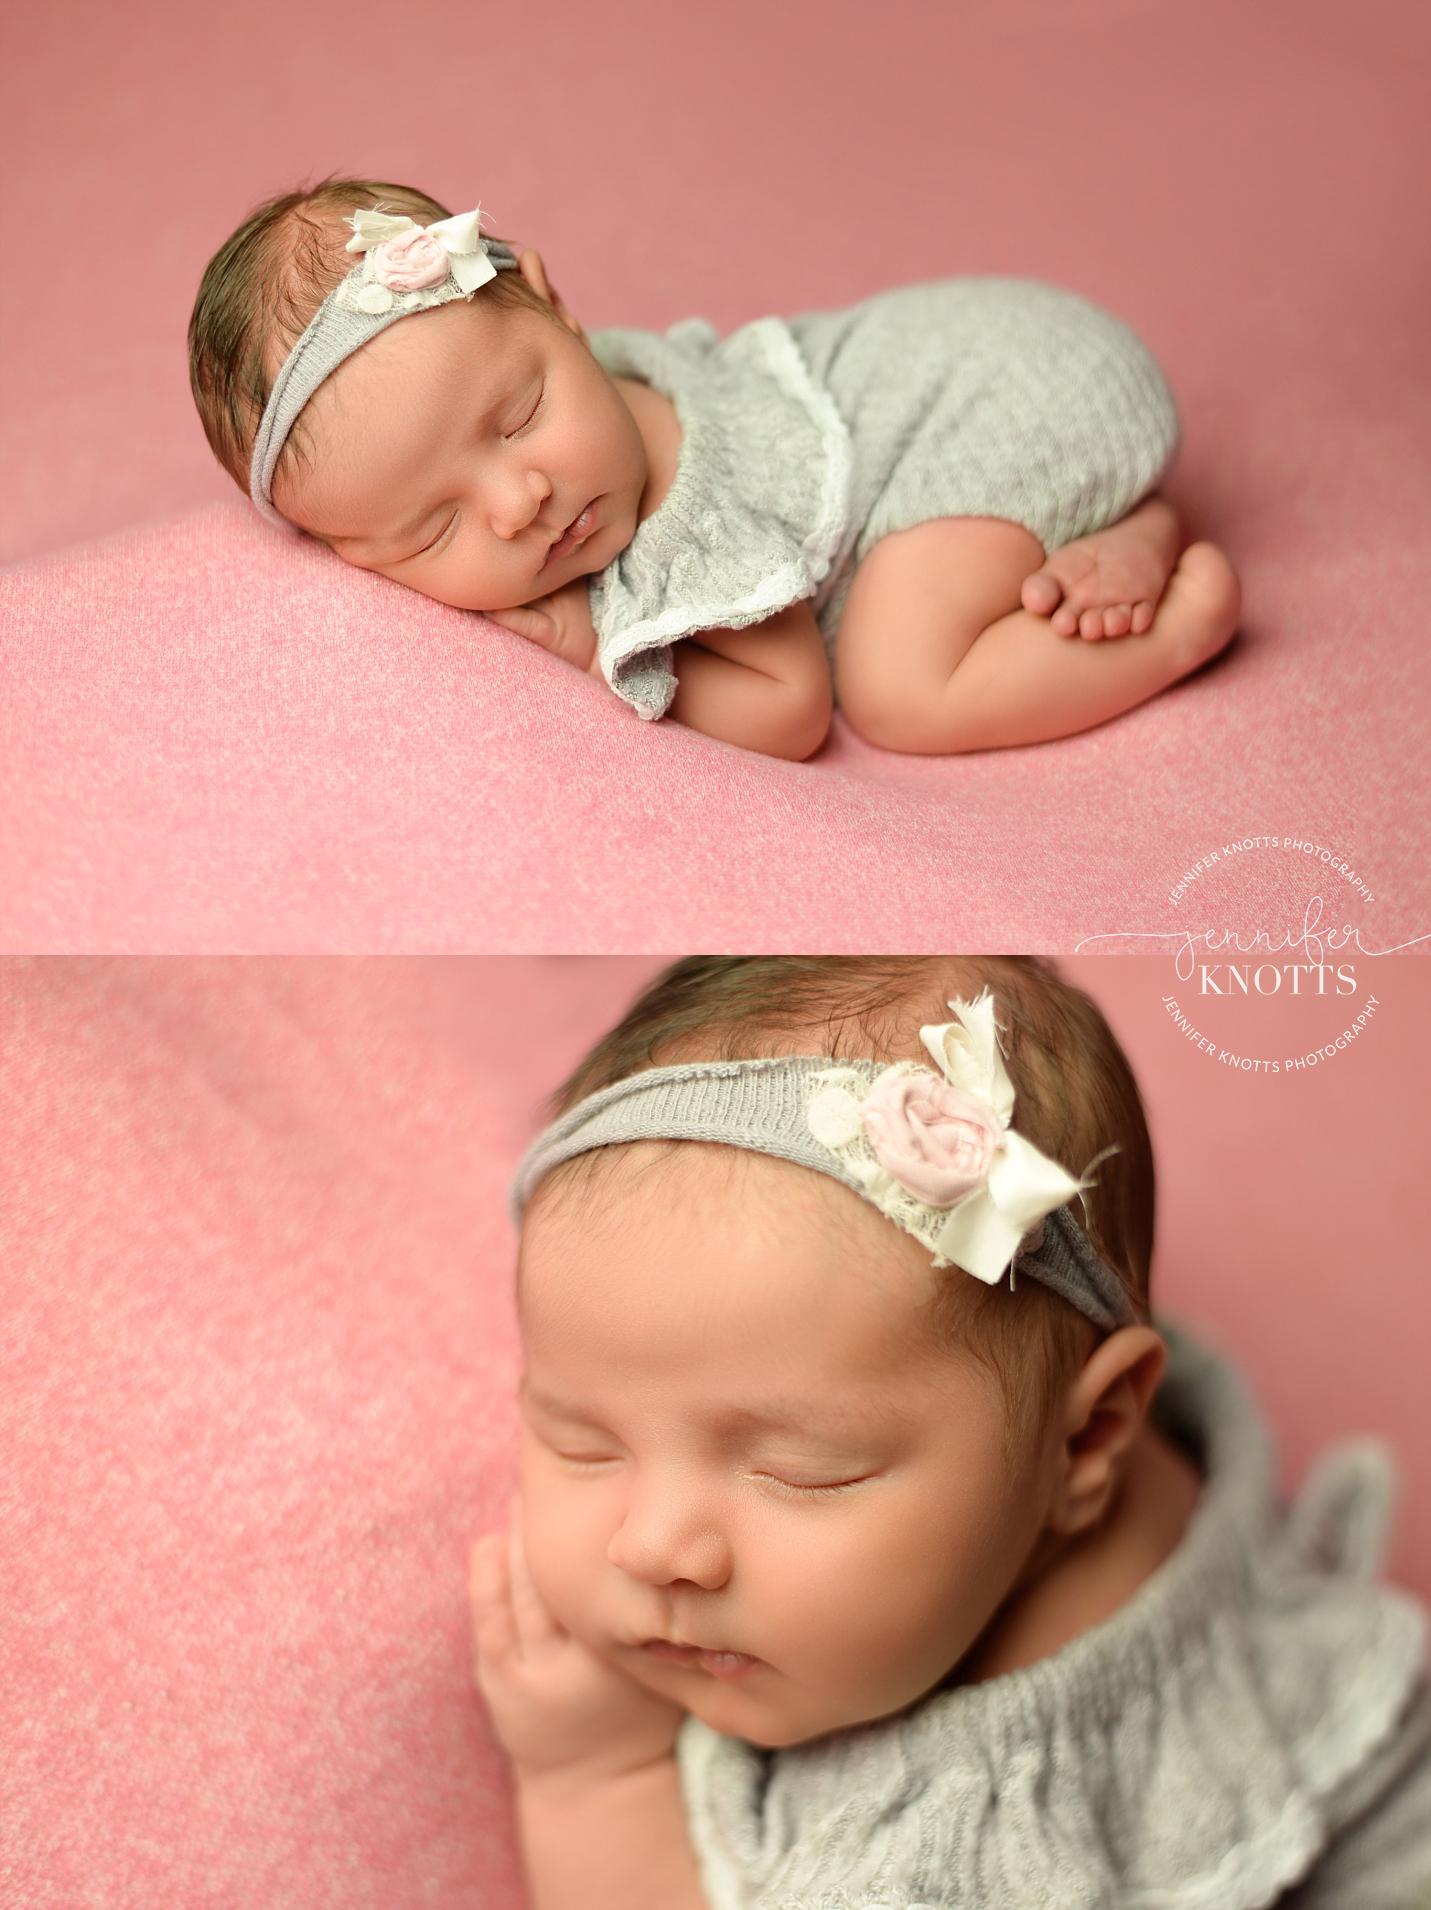 wilmington newborn photographer captures baby girl sleeping on pink fabric with hands tucked under cheeks